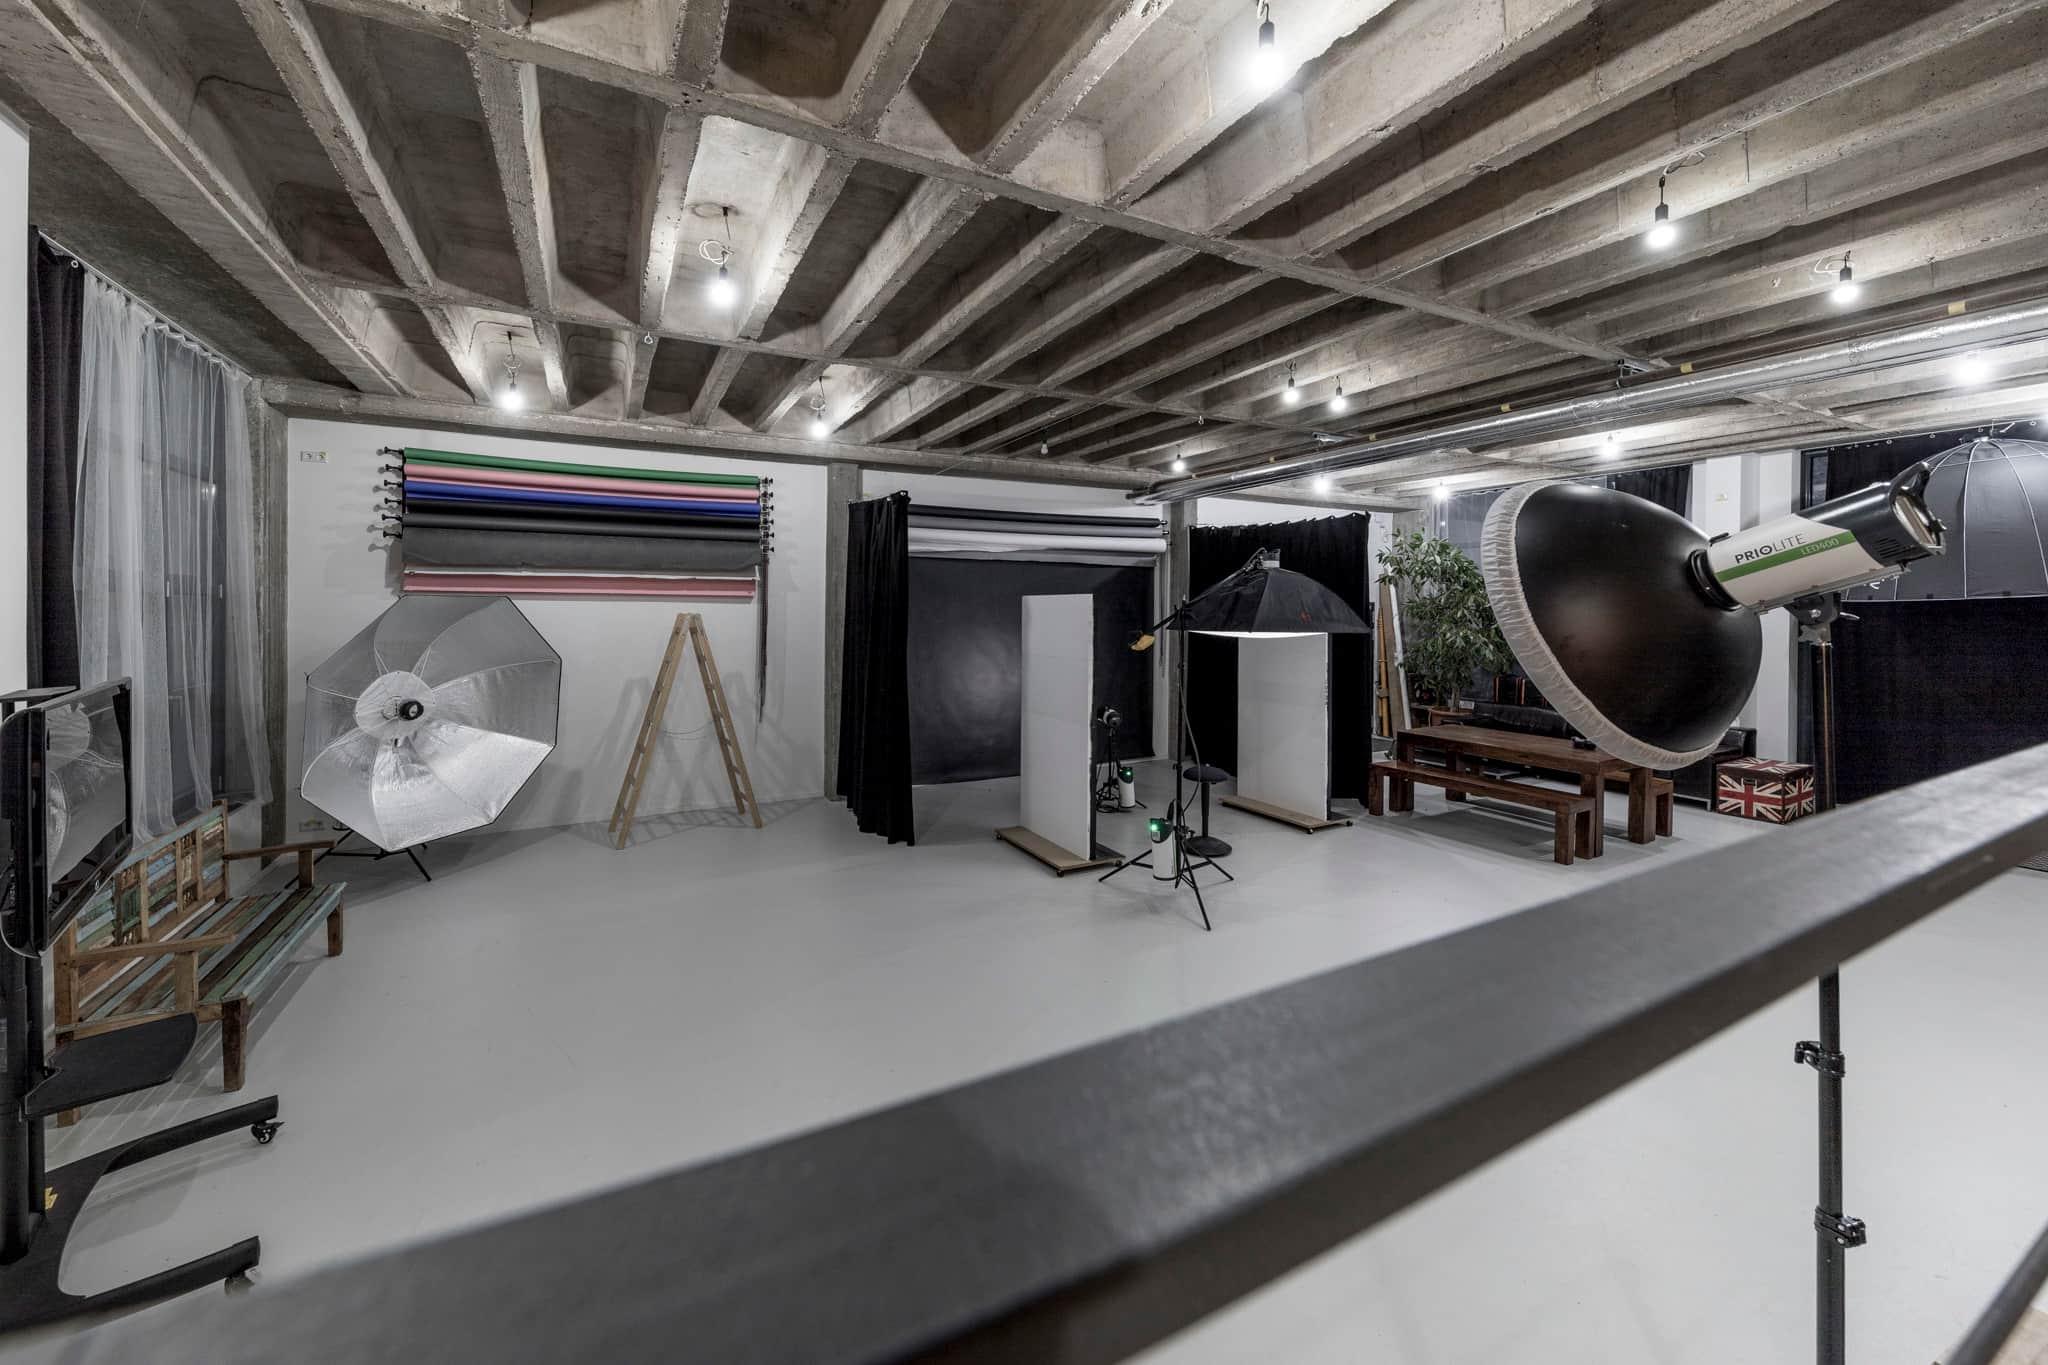 Fotostudio Studio-X1 Shooting Bereich Fotografie Foto Darmstadt Odenwald Gross-Bieberau Groß-Bieberau alte möbelfabrik